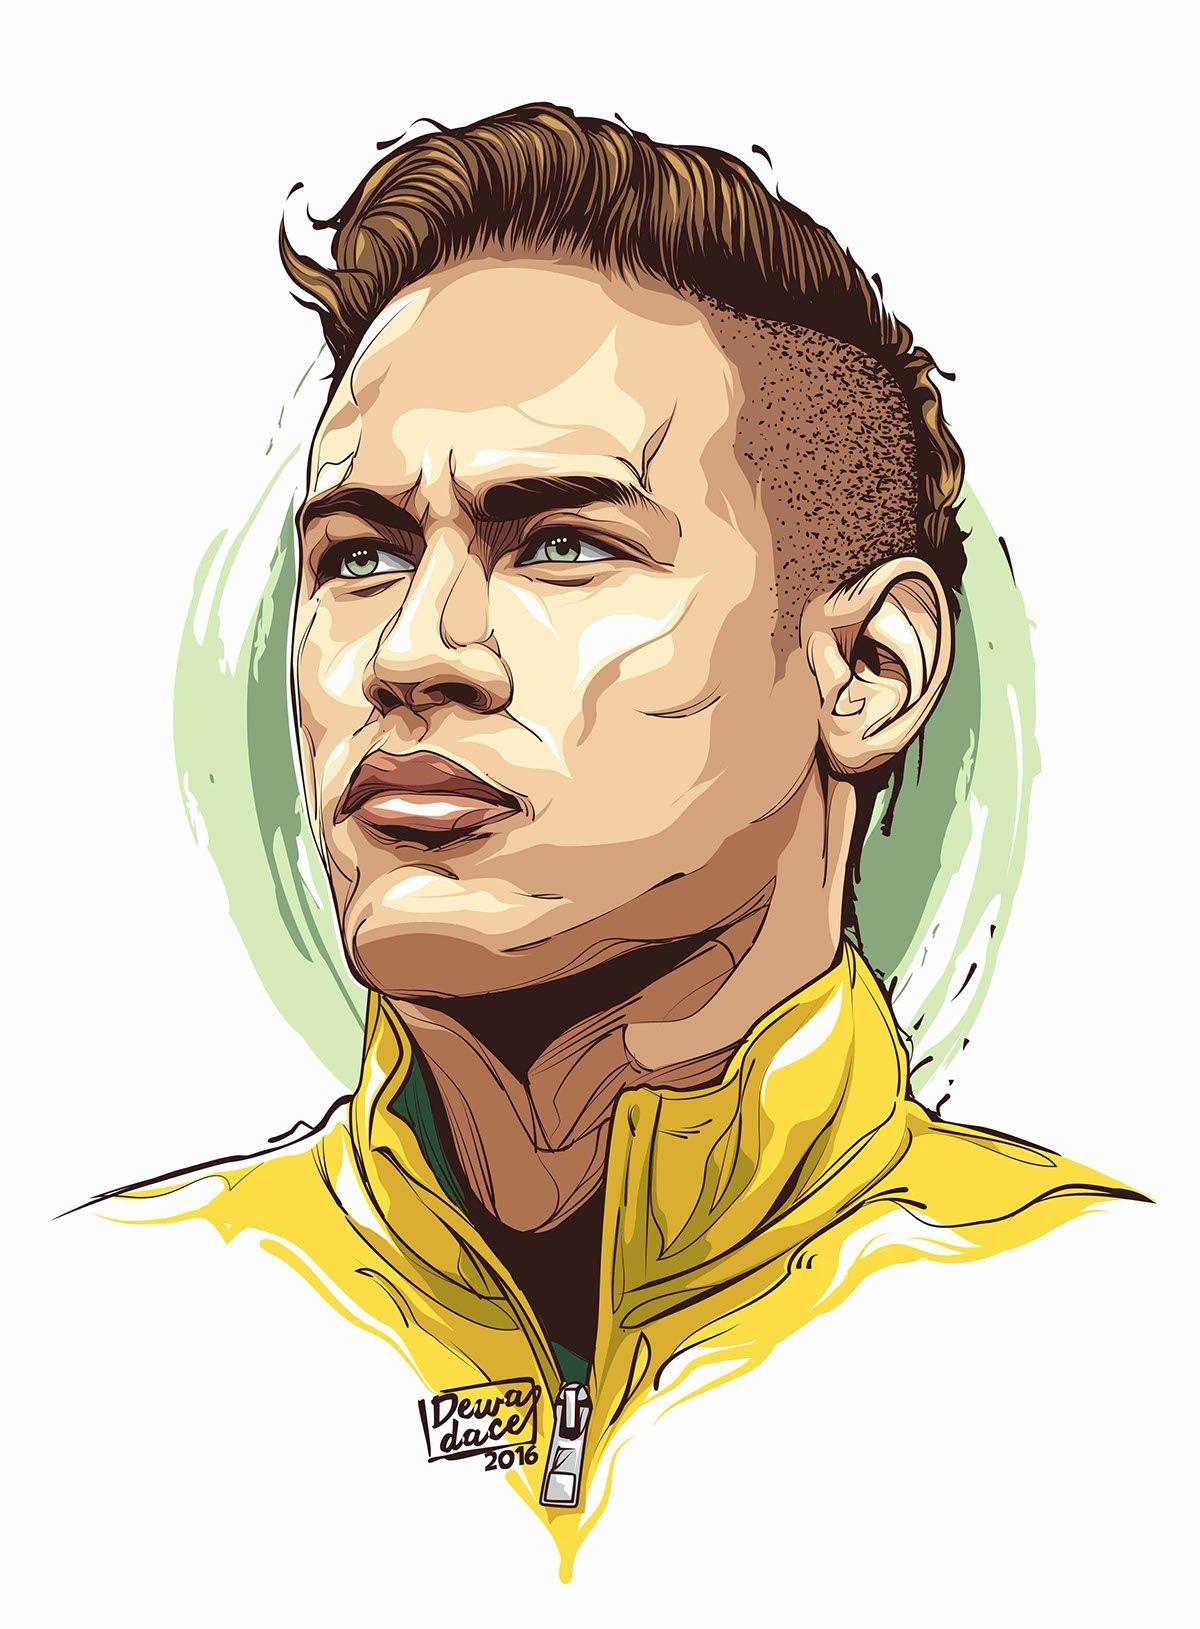 Newmar Jr Neymar Jr Wallpapers Neymar Jr Football Player Drawing